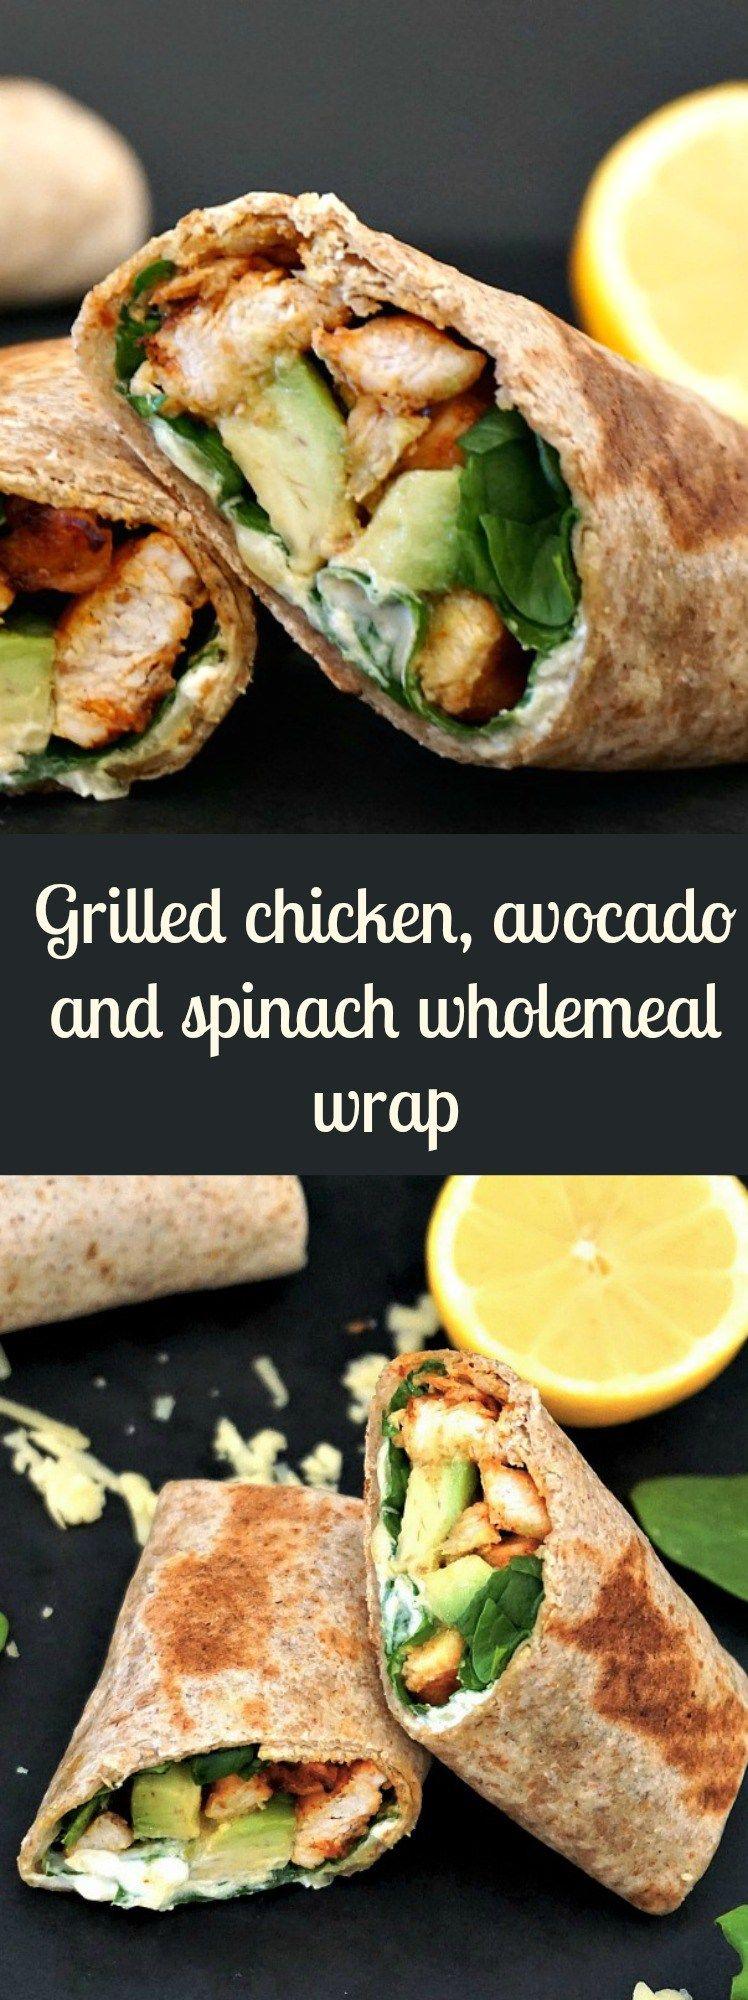 Grilled Chicken Avocado Wrap (Low Carb, High Protein) #healthyavocadorecipes